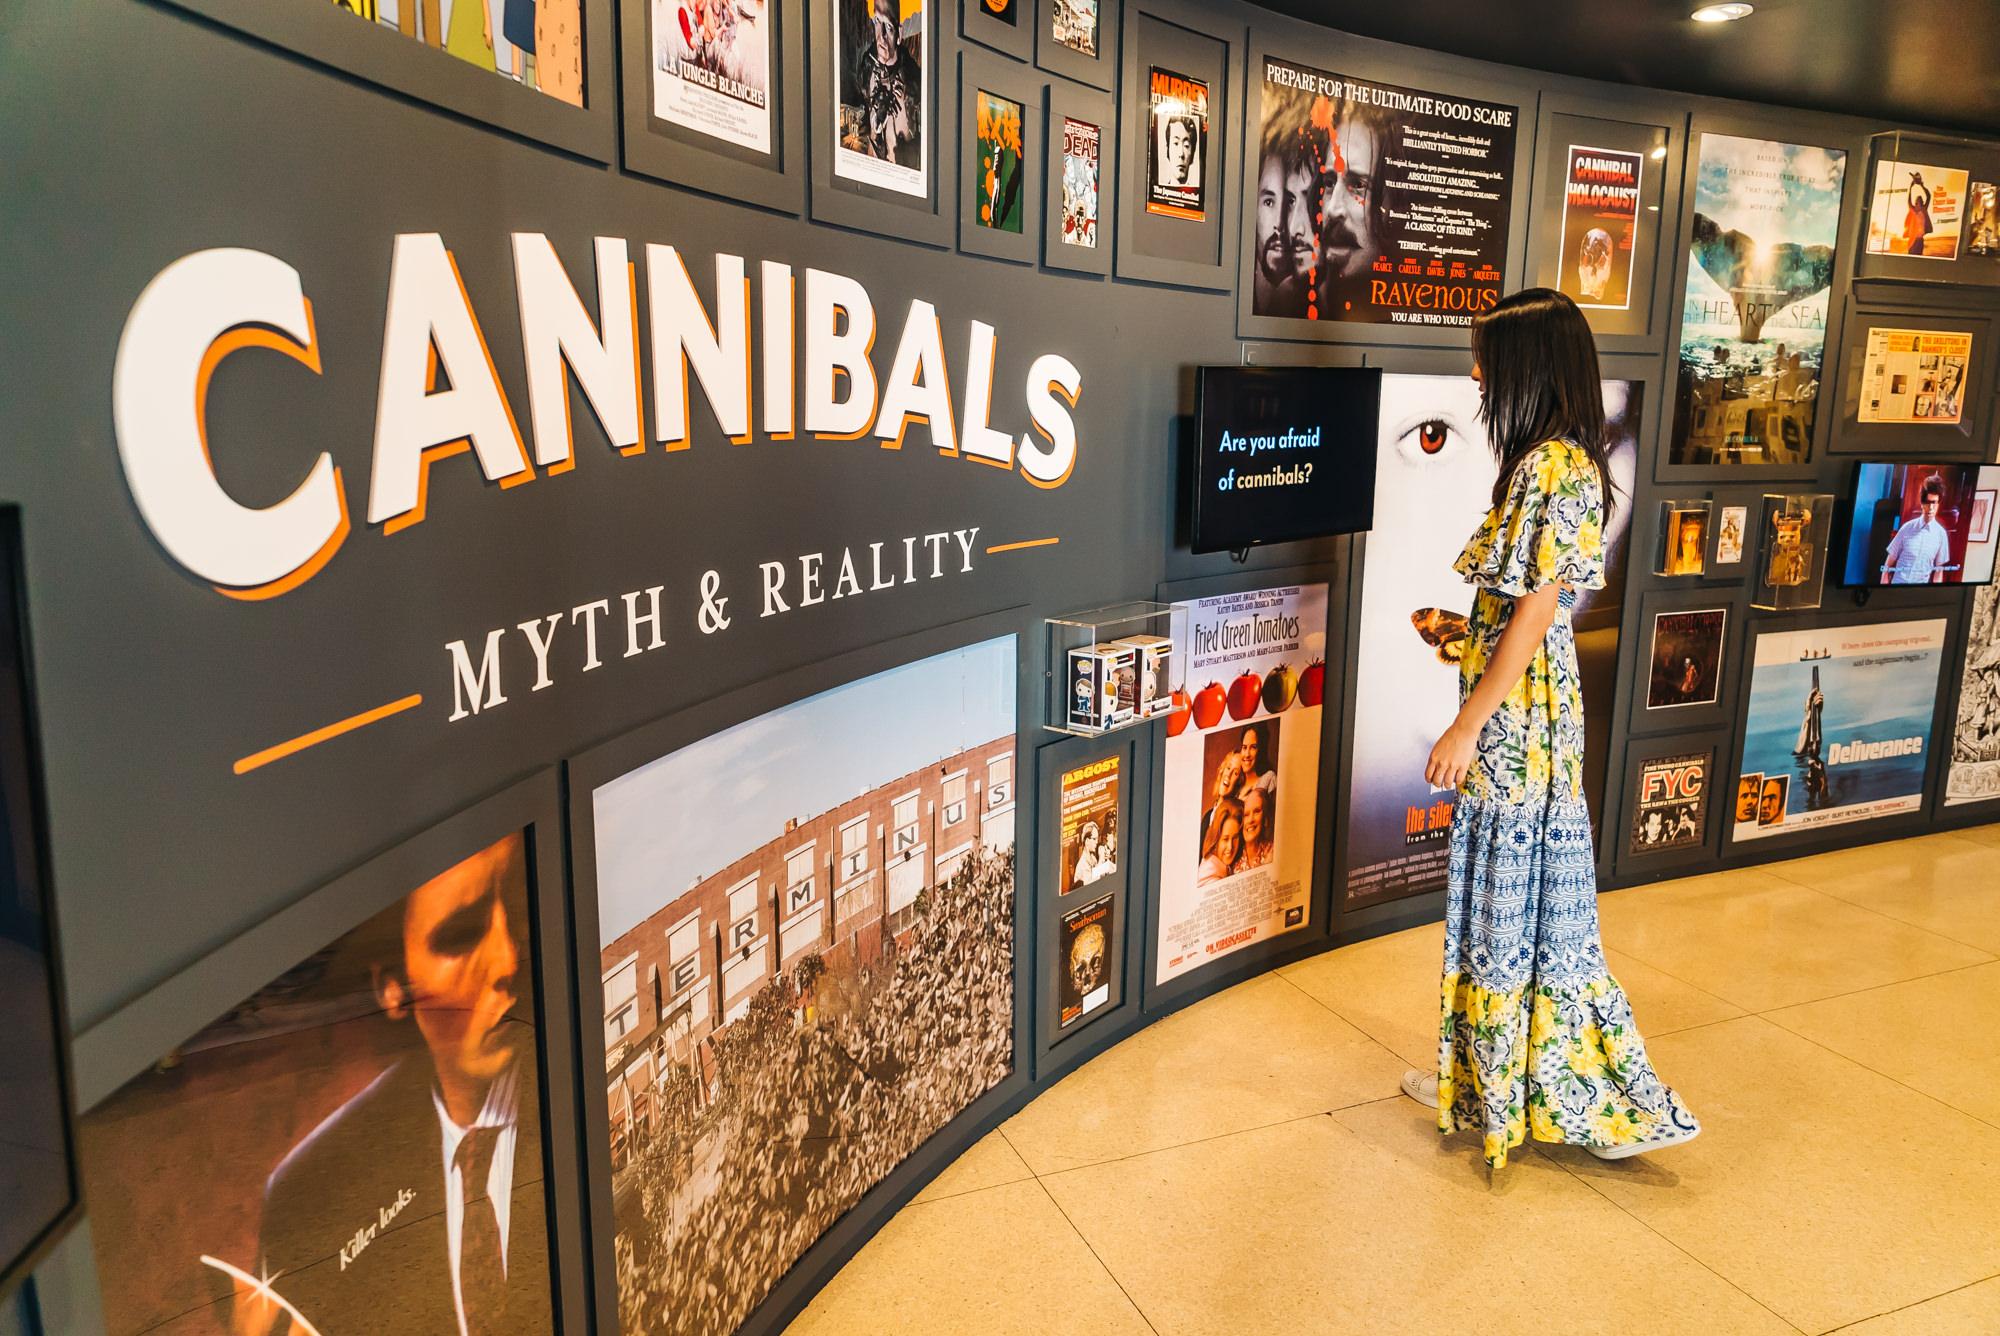 Cannibals Exhibit Entrance